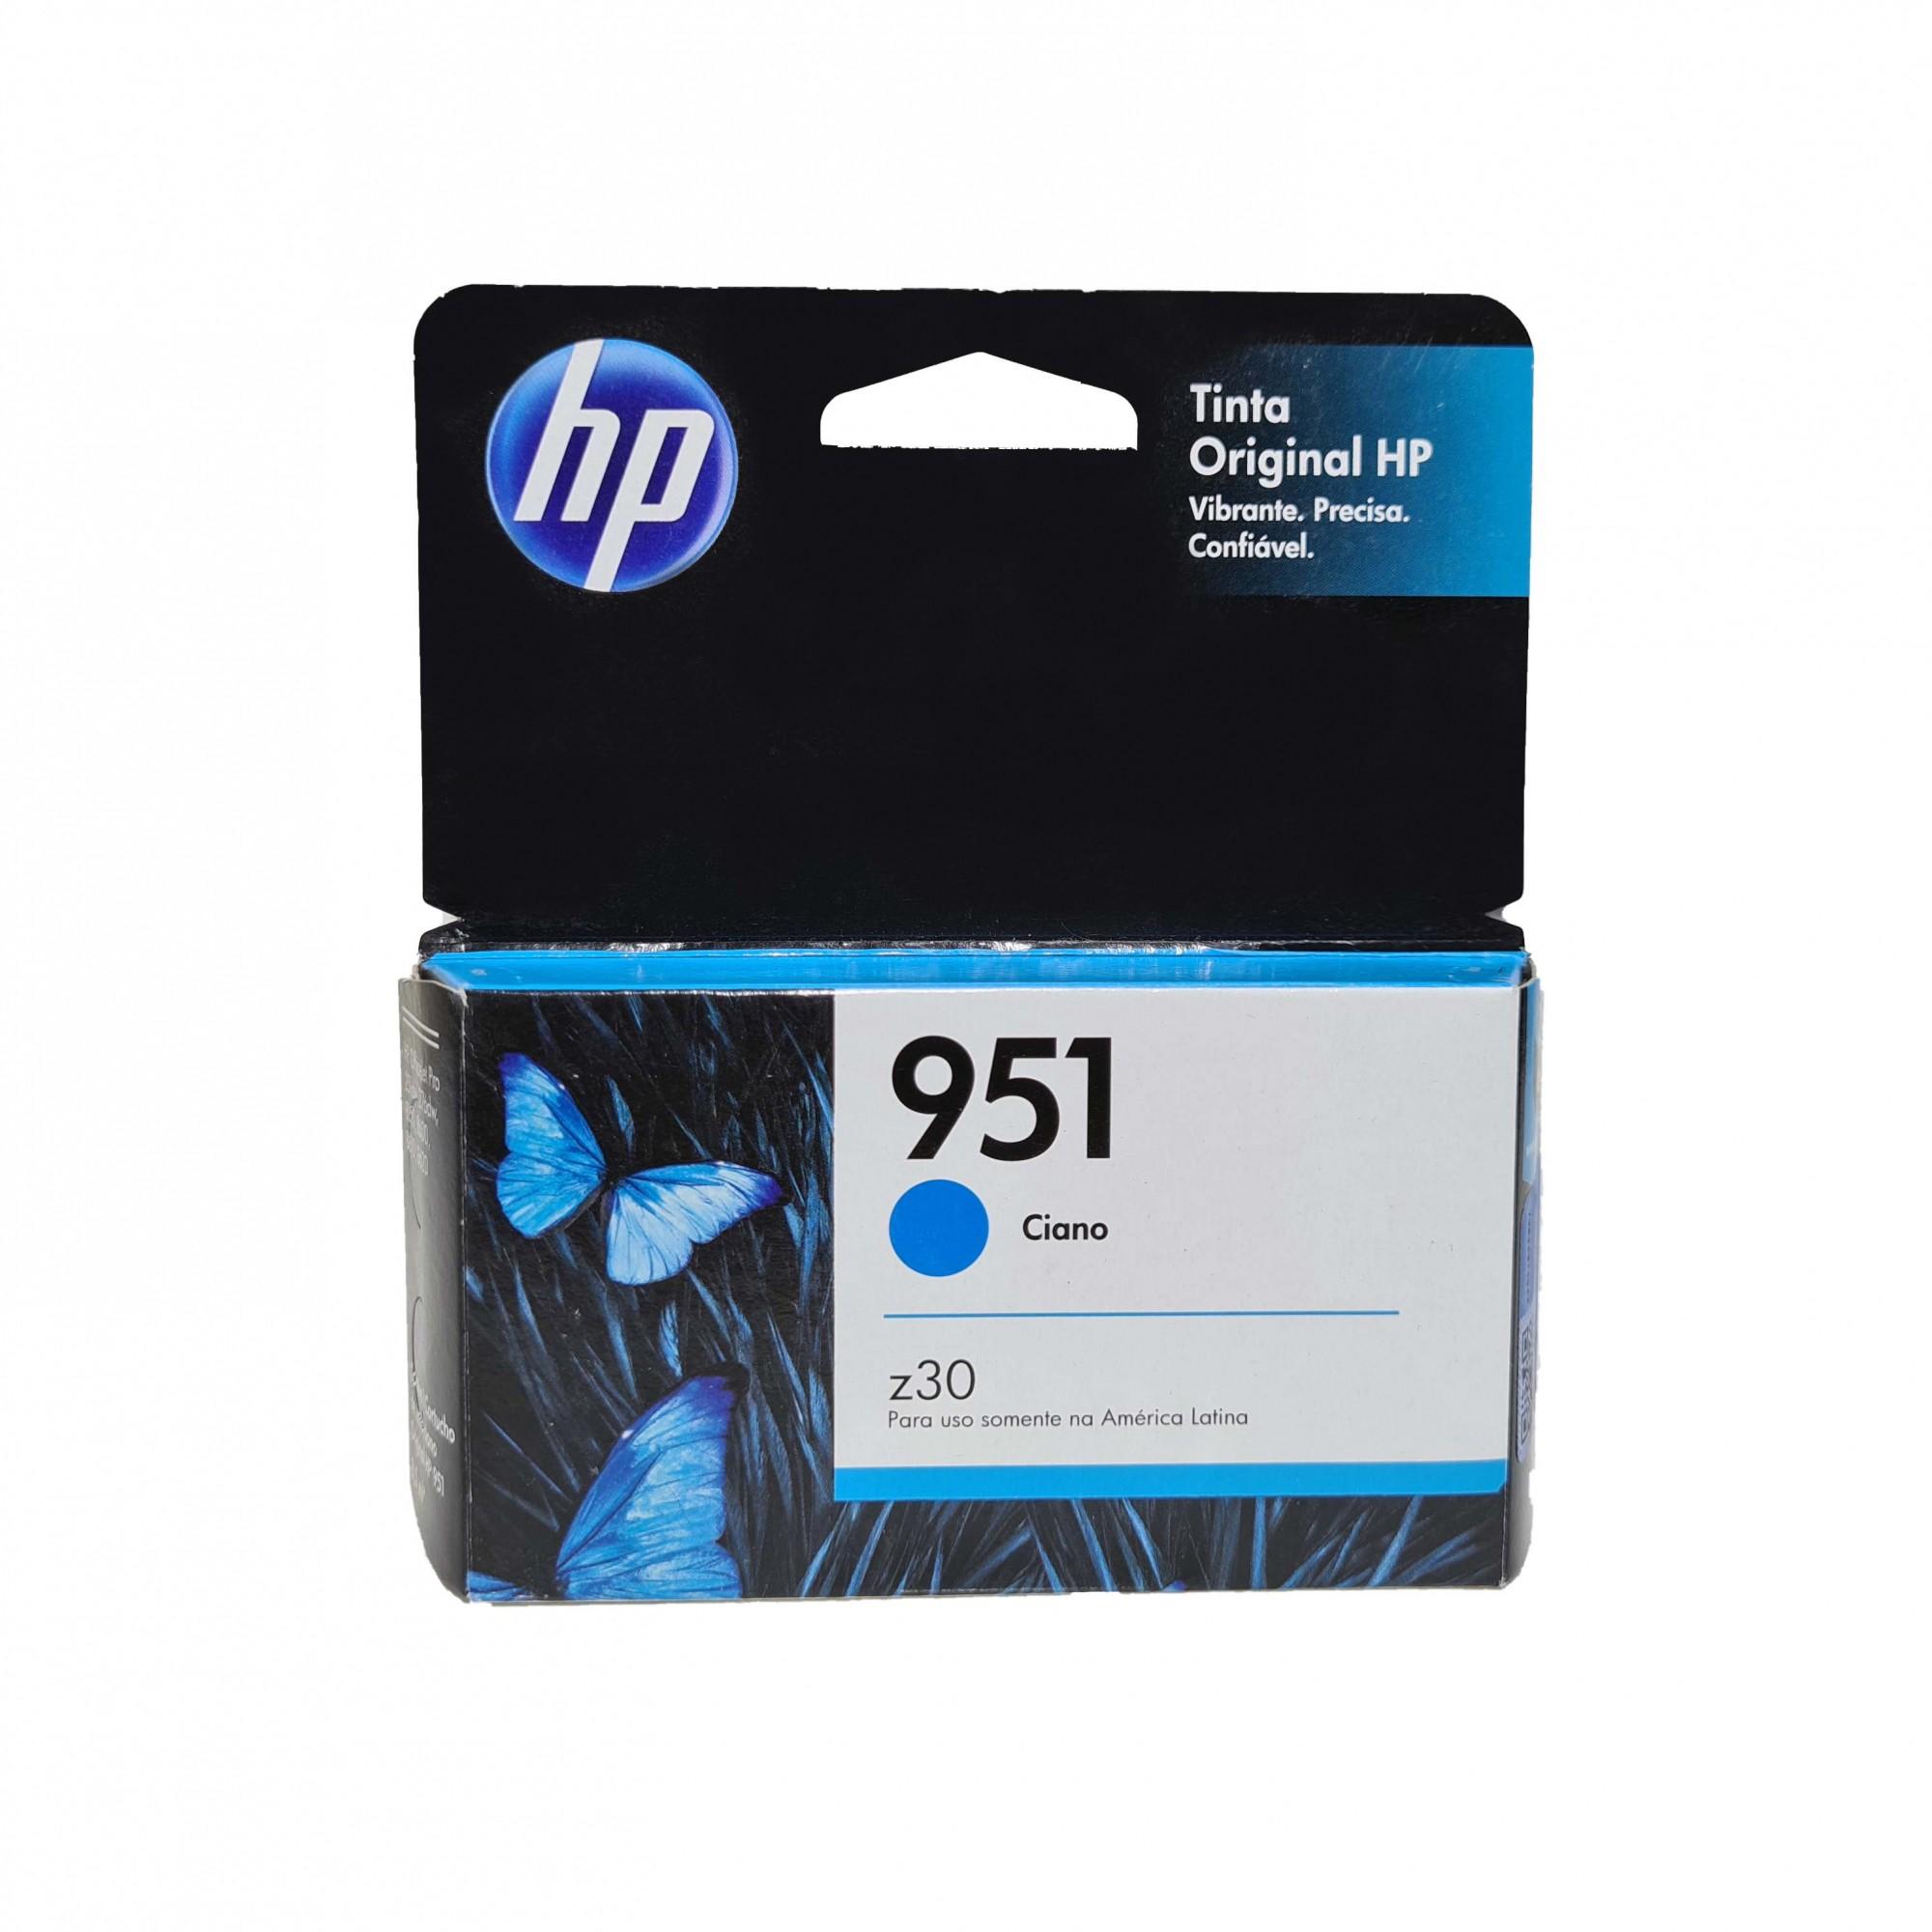 Cartucho HP 951 CN050AL Ciano  para 8100 e 8600